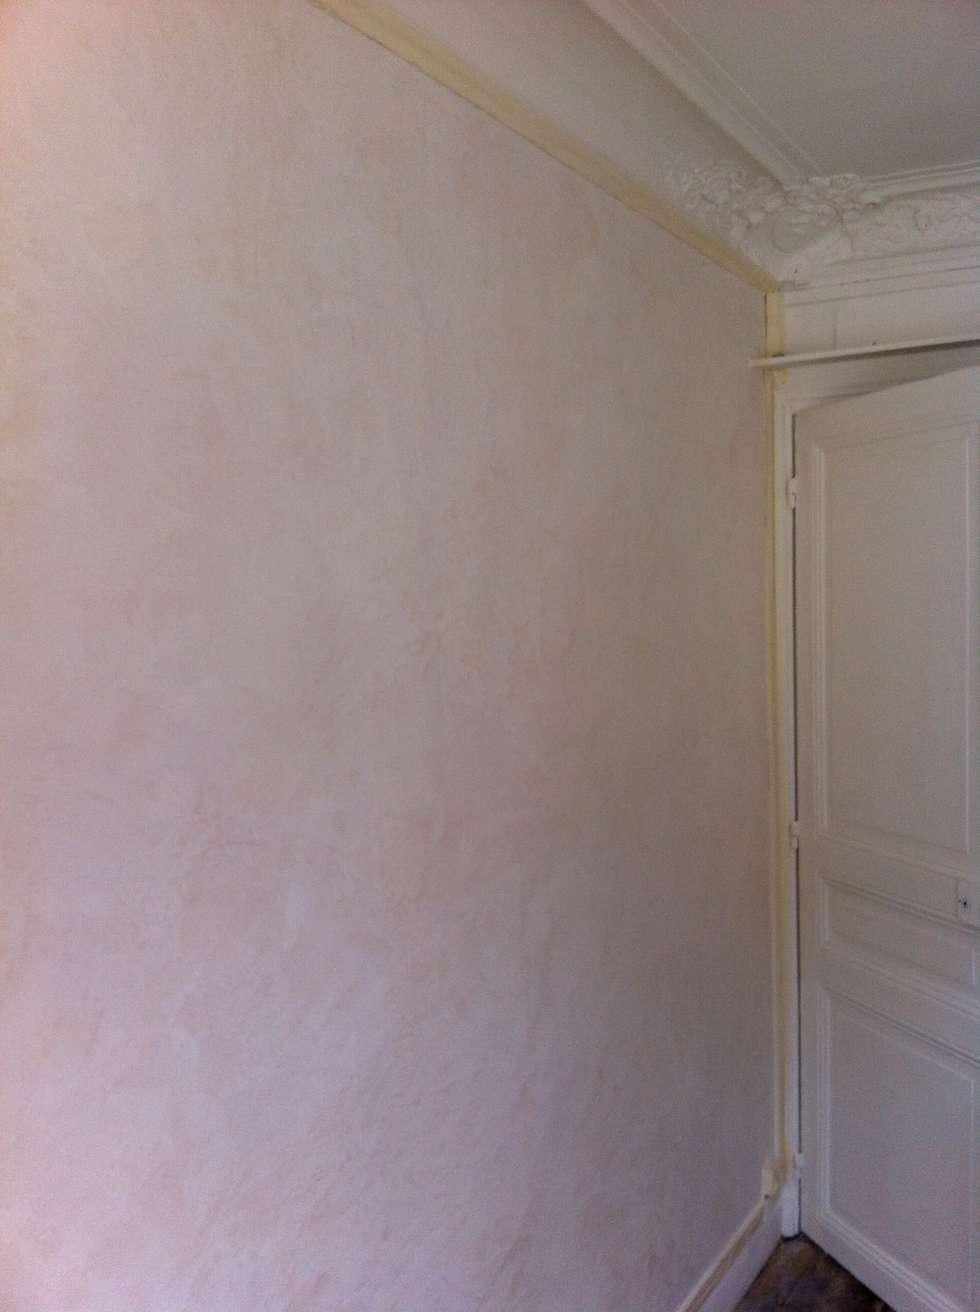 Peinture murale stucco simple la lumire circule dans - Peinture decorative stucco ...